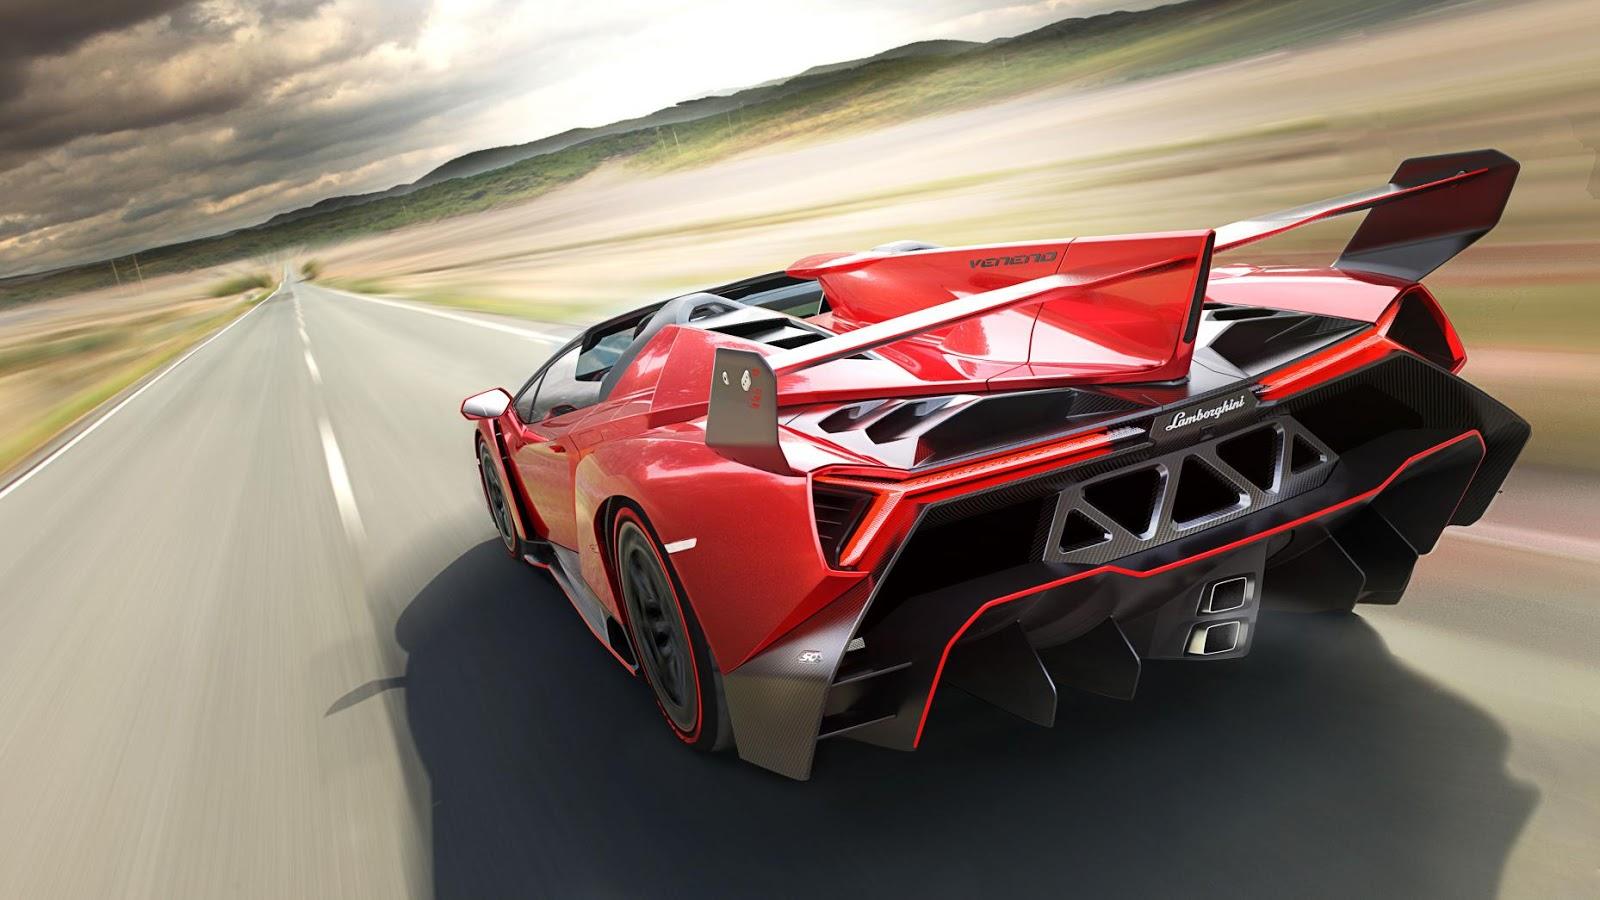 2013 Lamborghini Veneno Roadster